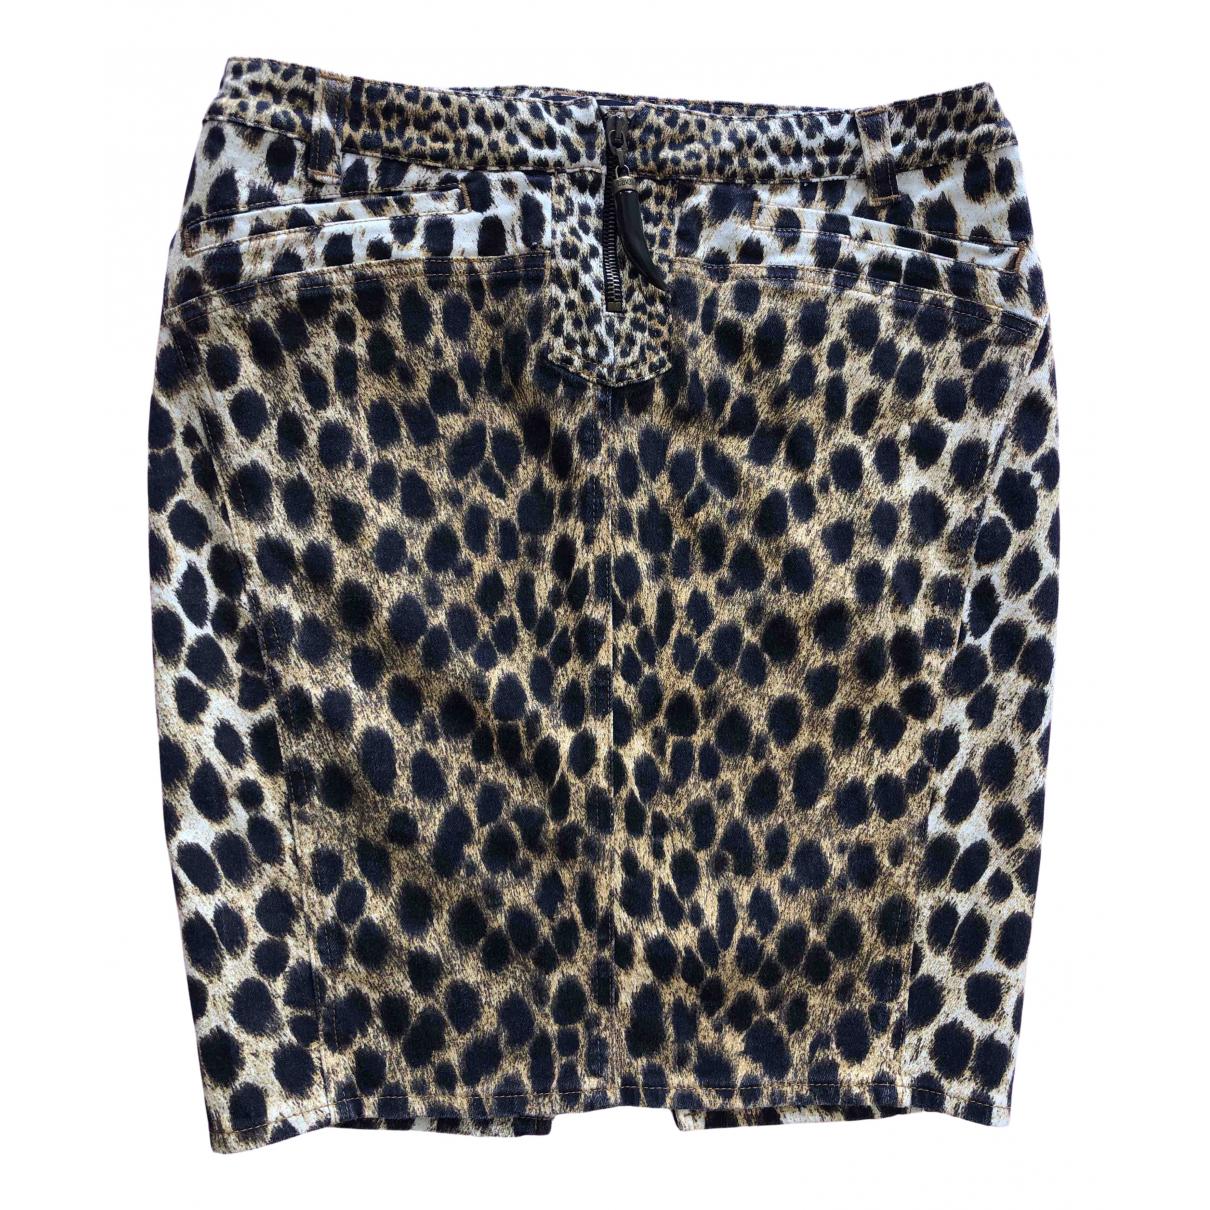 Just Cavalli N Black Cotton - elasthane skirt for Women 40 IT